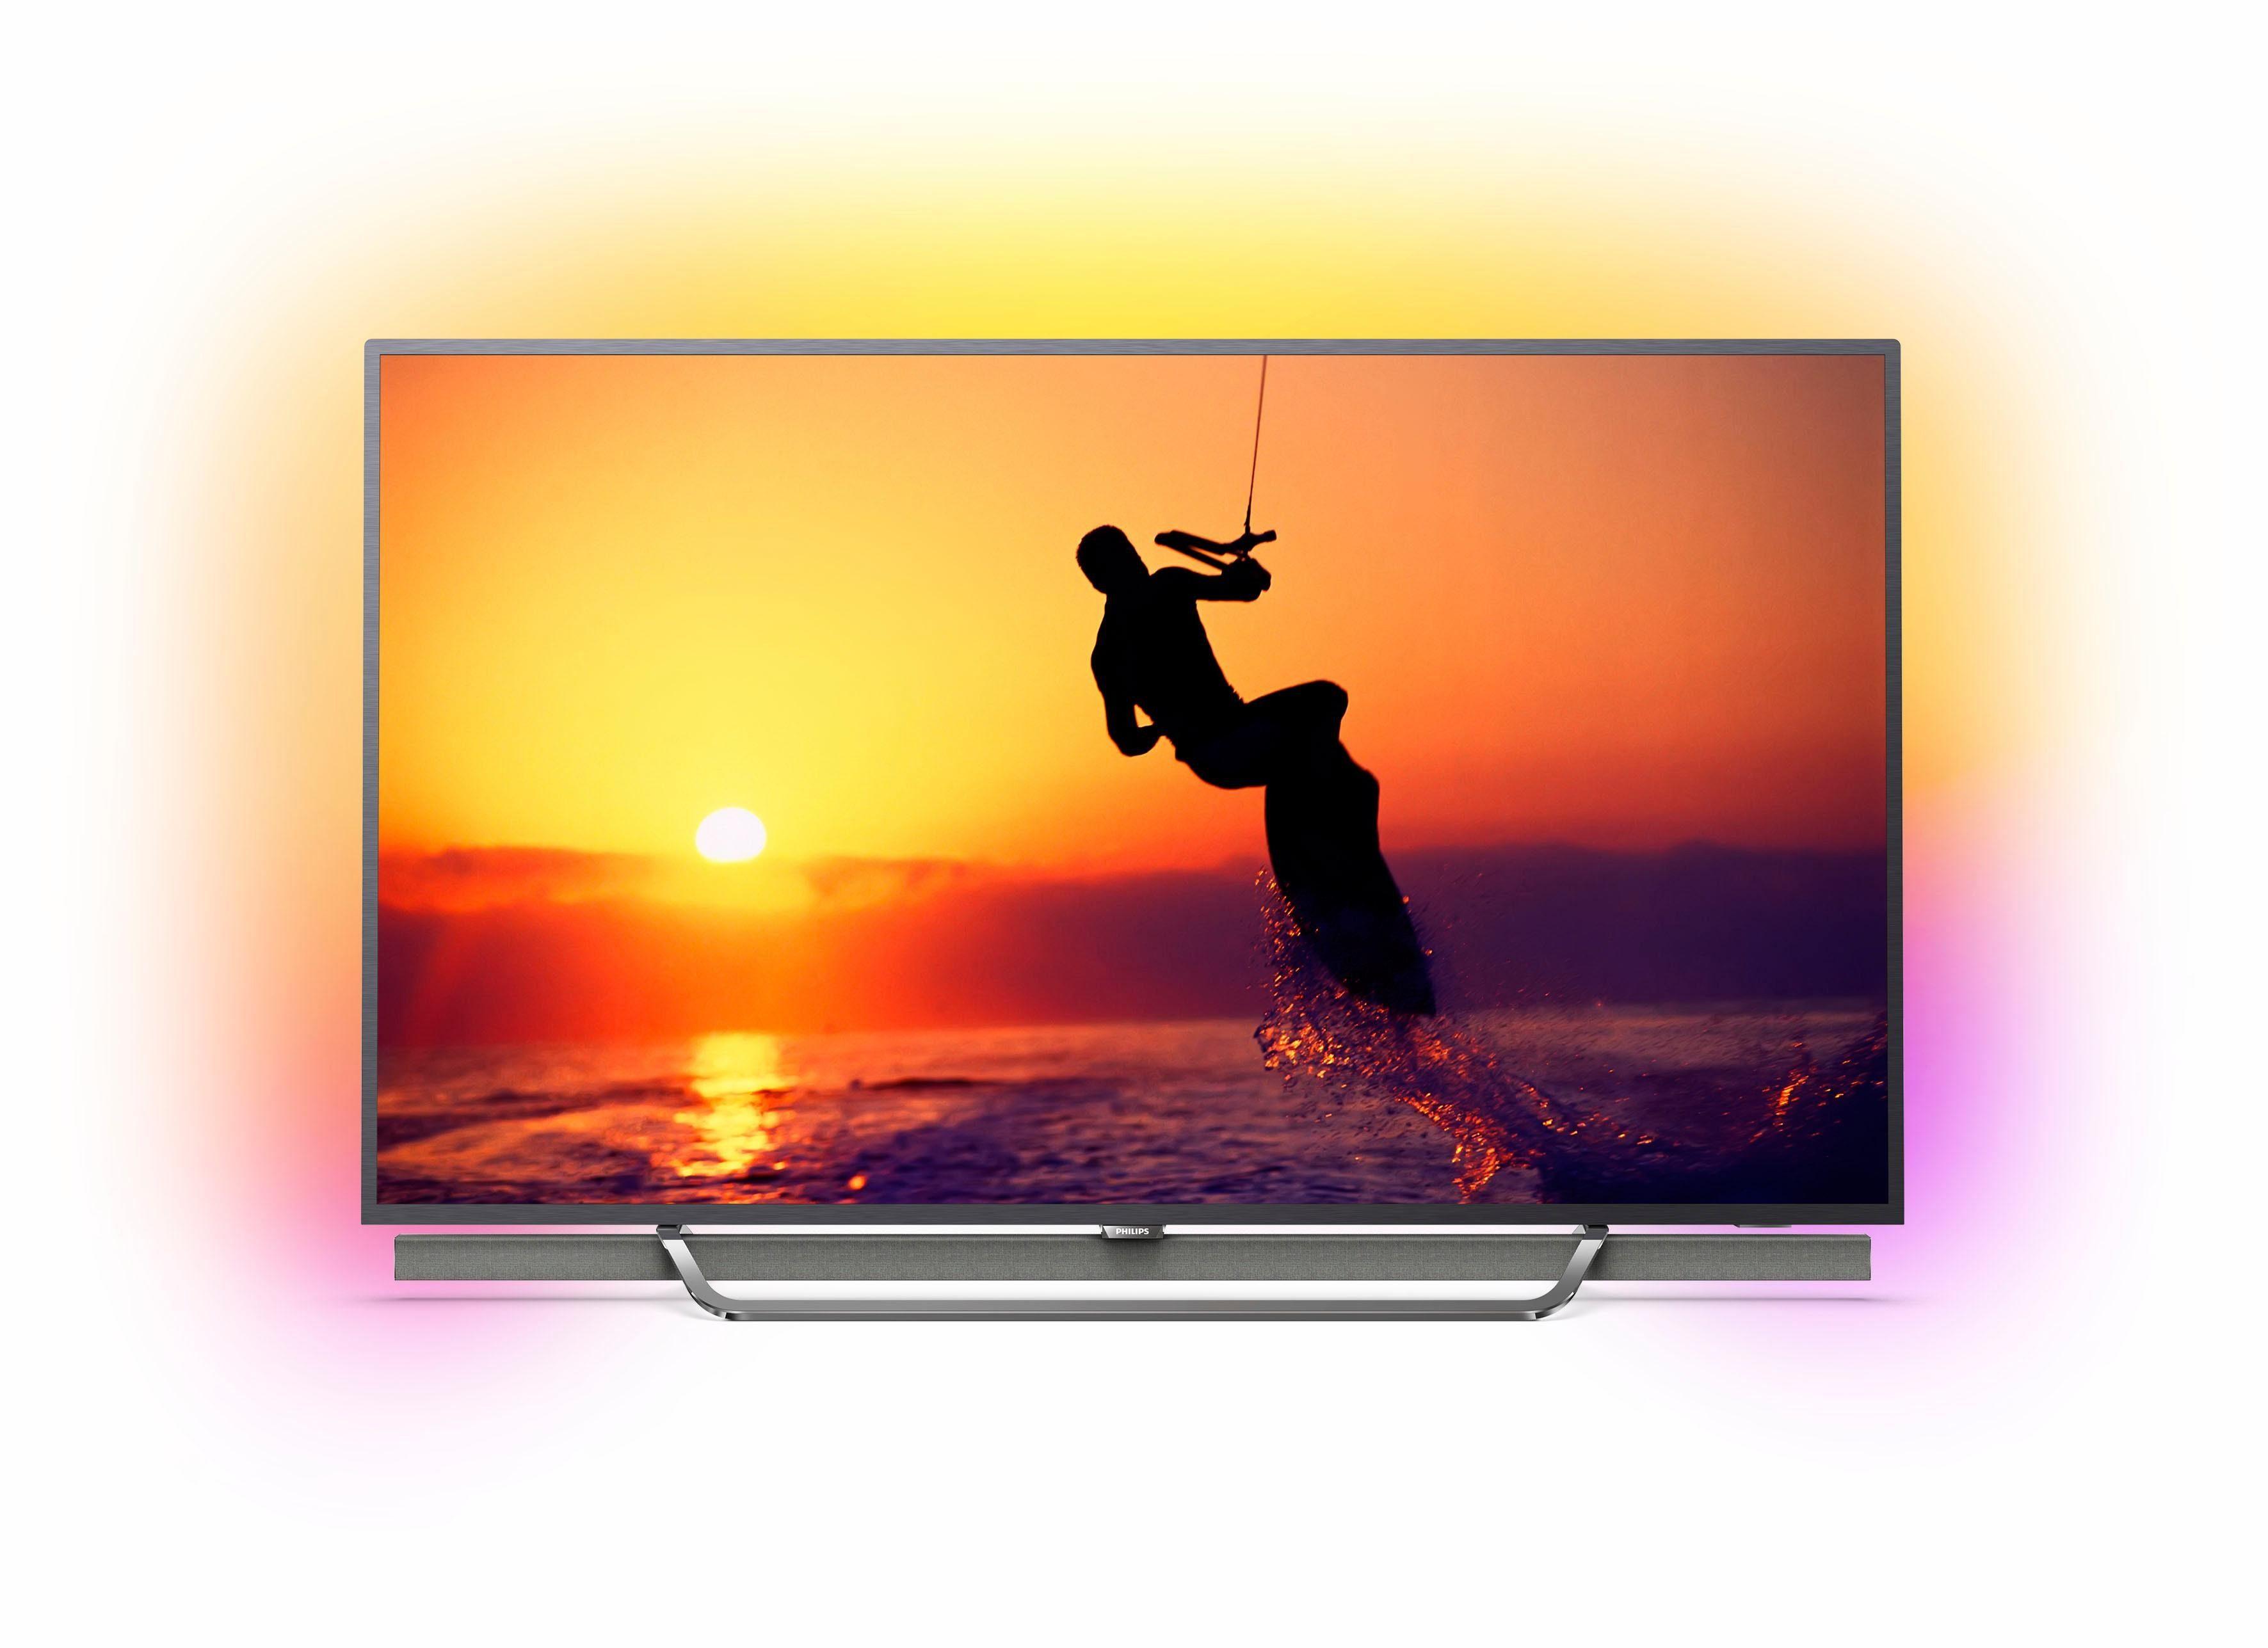 Philips 55PUS8602/12 LED-Fernseher (139 cm/55 Zoll, 4K Ultra HD, Smart-TV, Quantum Dot)